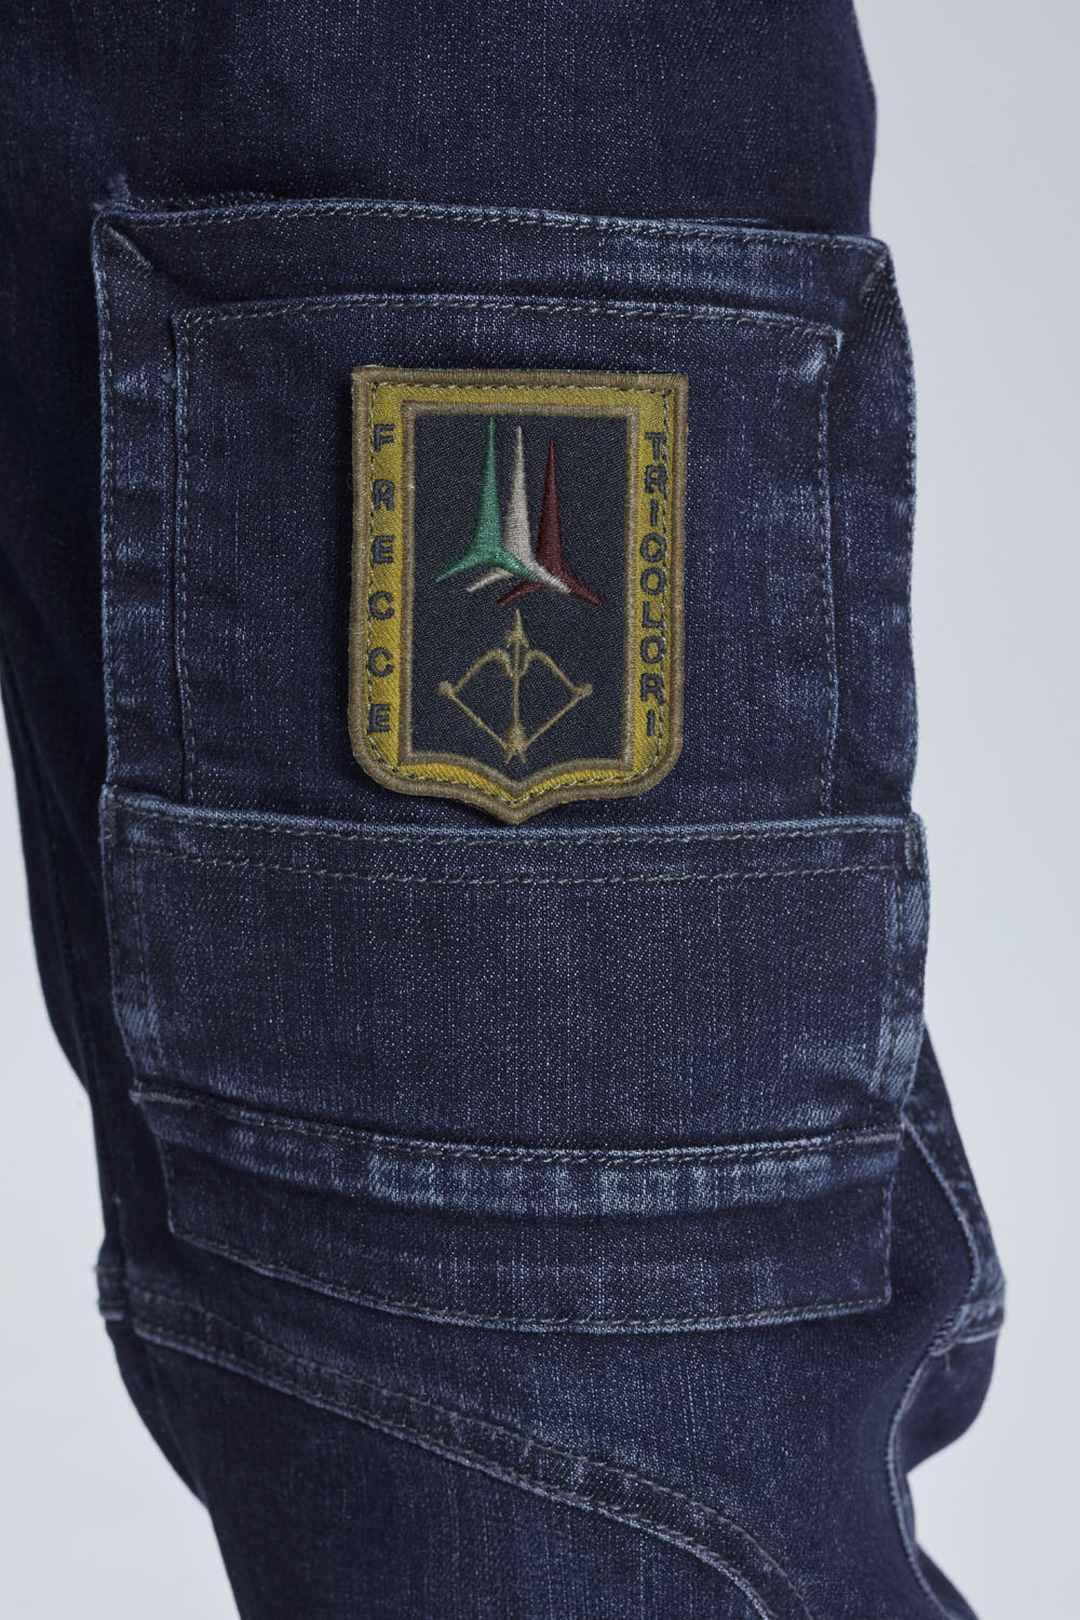 Anti-G Hose aus Stretch Jeans Stoff      5